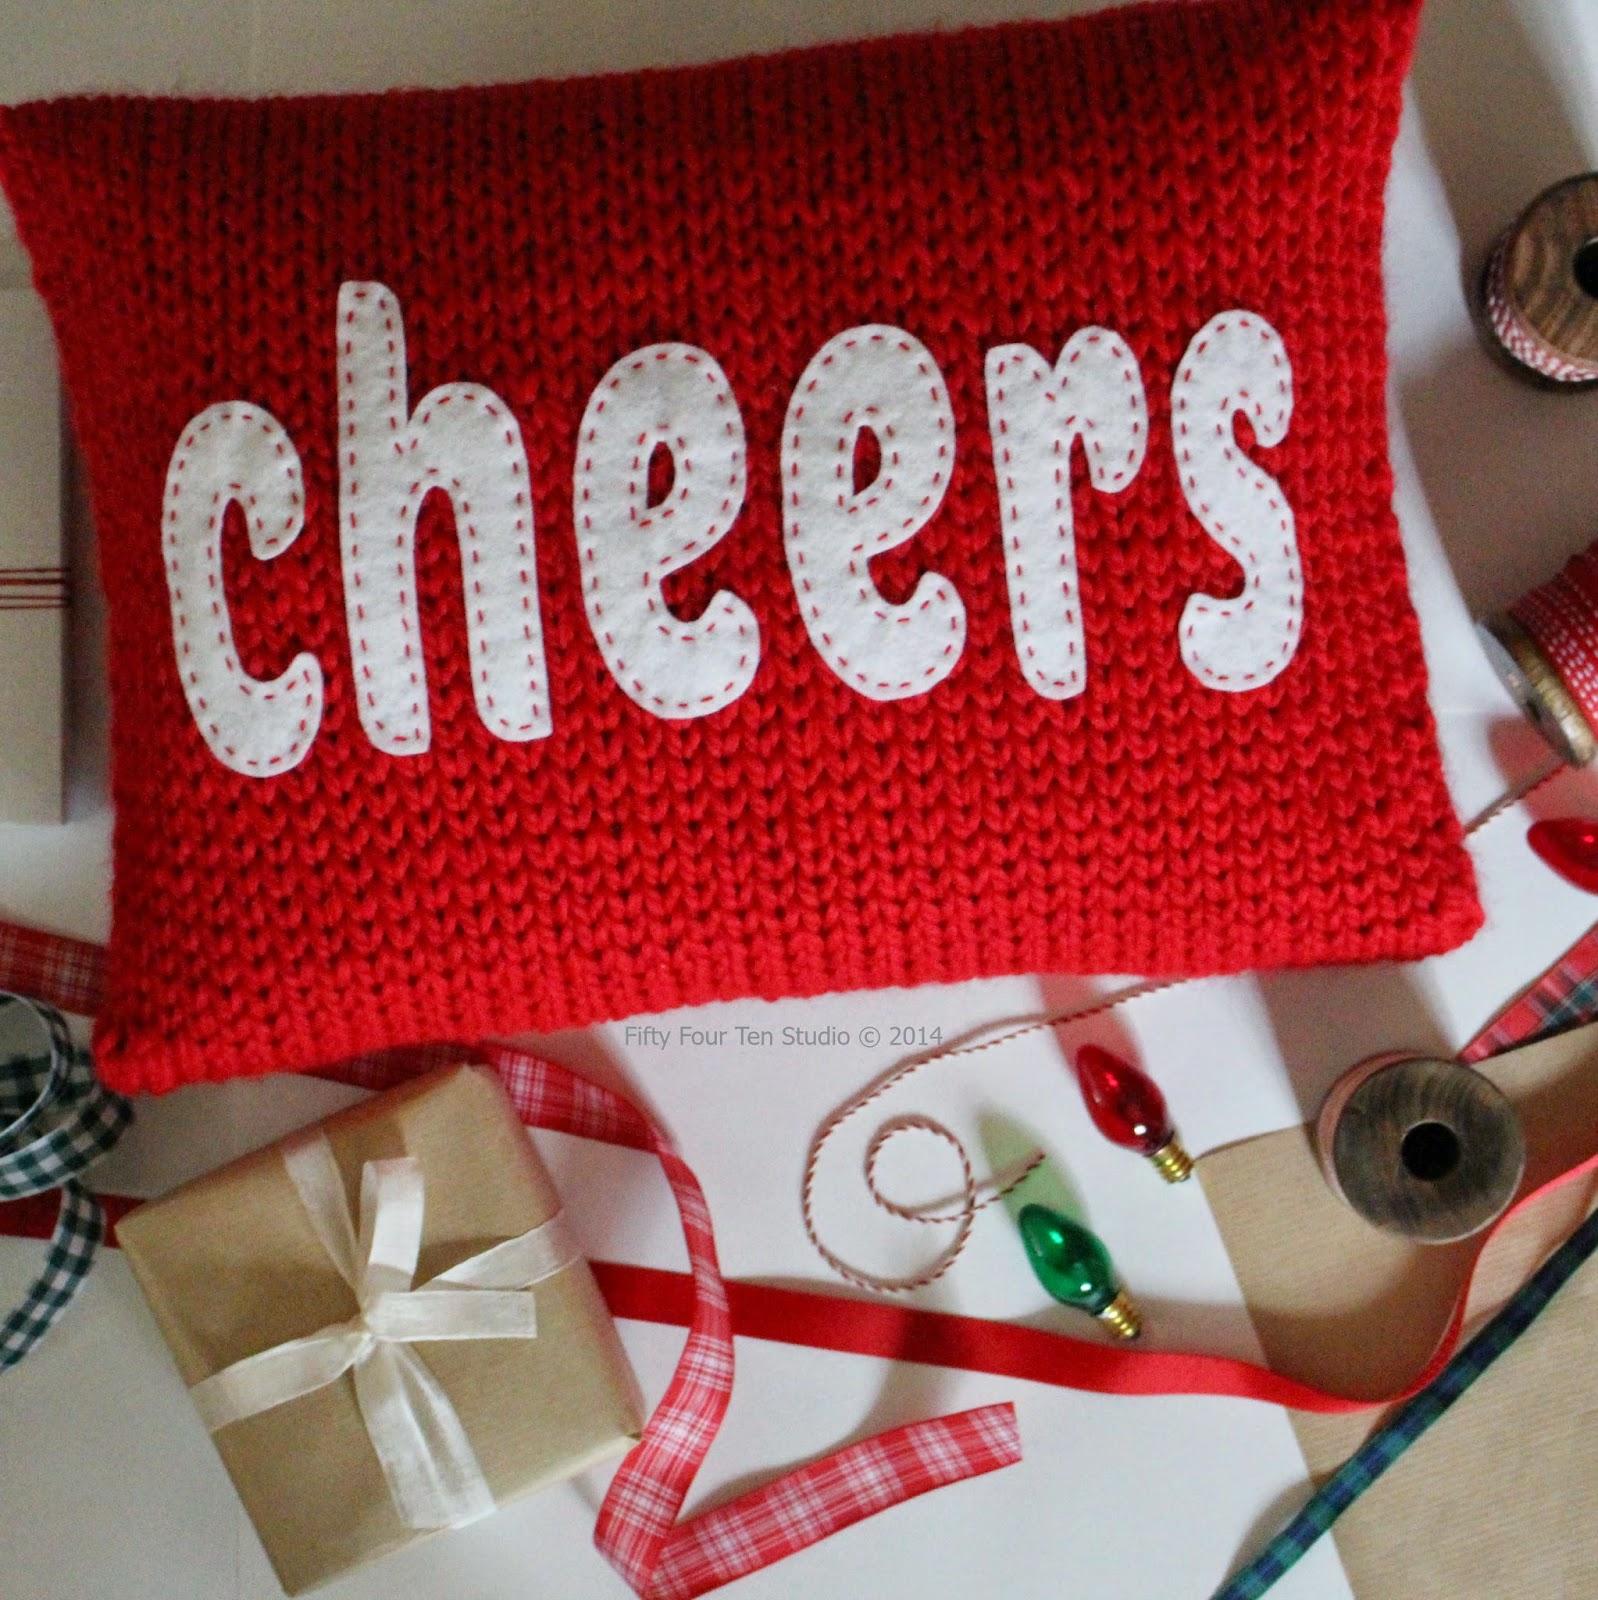 Knitting Pattern Christmas Cushion : Fifty Four Ten Studio: Merry & Cheers Christmas Pillows Knitting Pattern